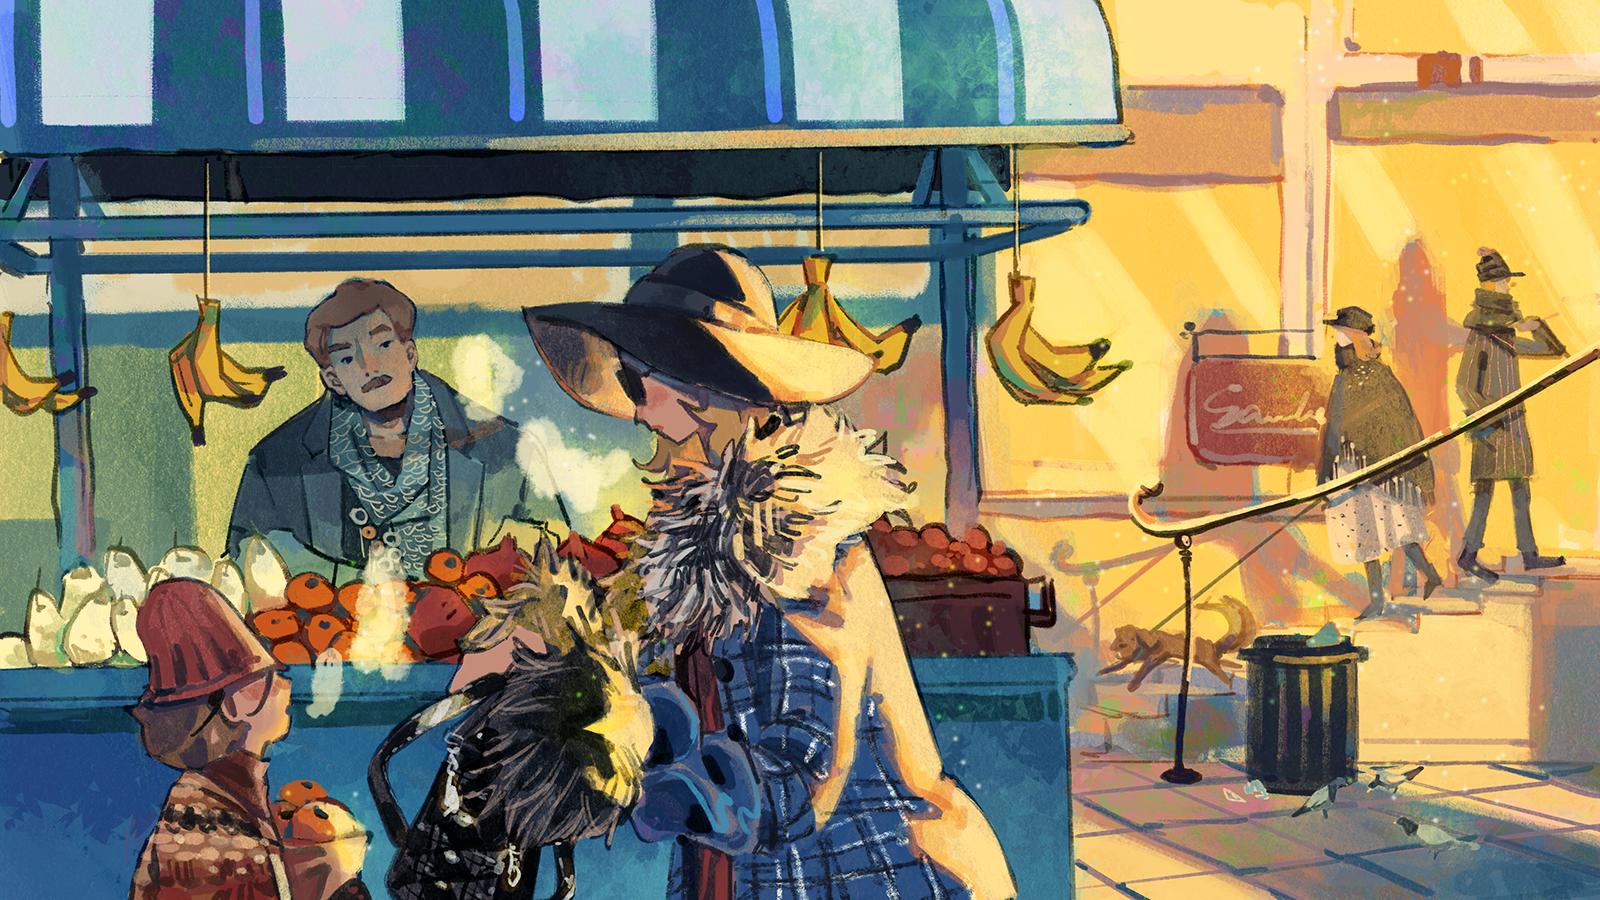 Digital Illustration describing an outdoor market on a cold morning.